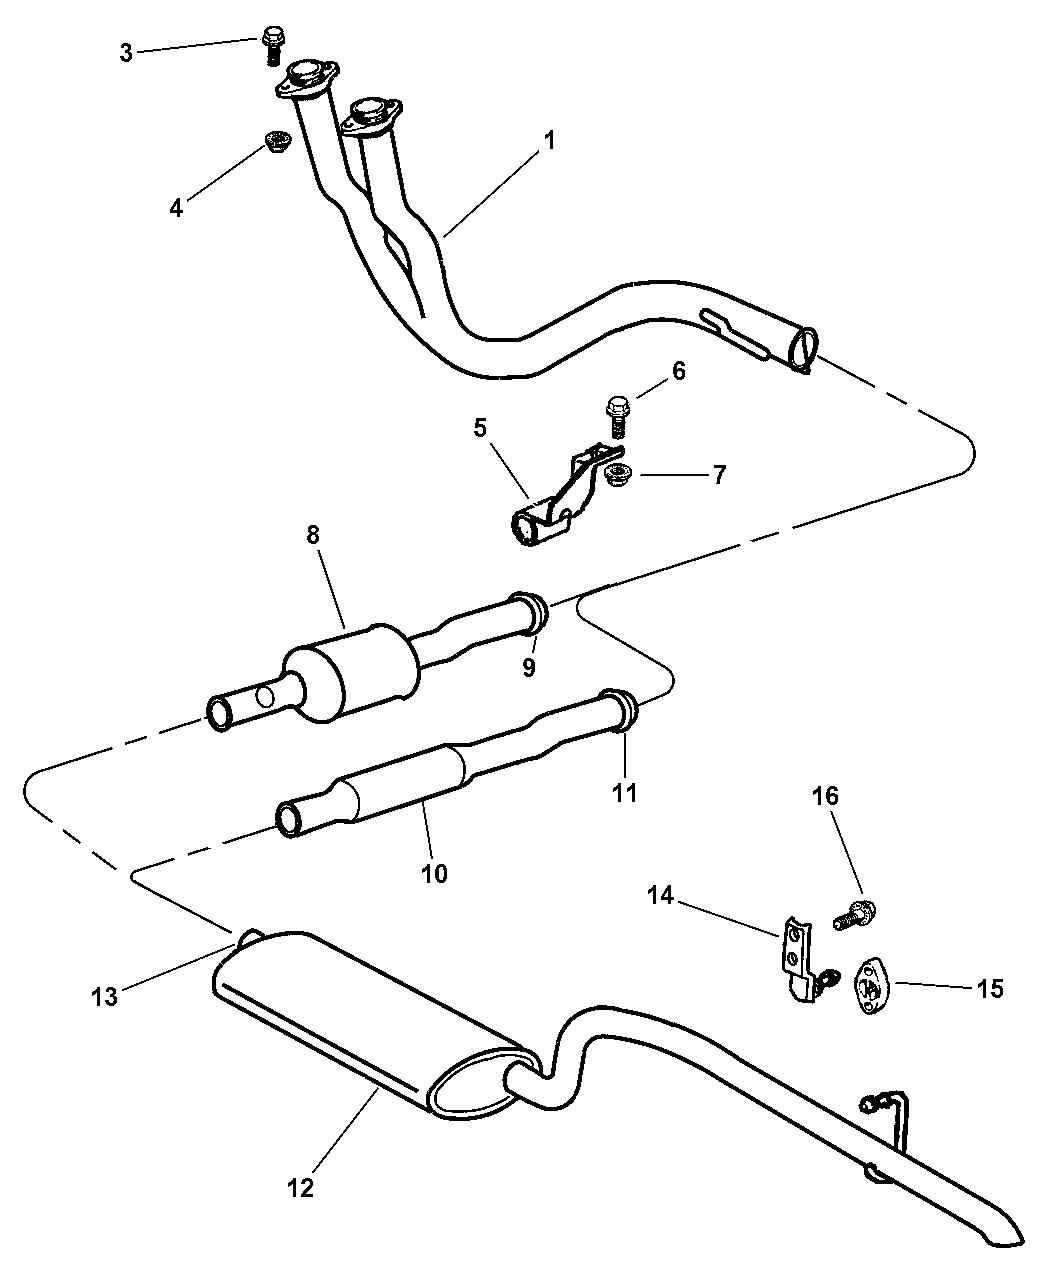 1997 jeep cherokee exhaust diagram 52101040 - genuine jeep clamp-exhaust 1997 jeep cherokee wiring diagram